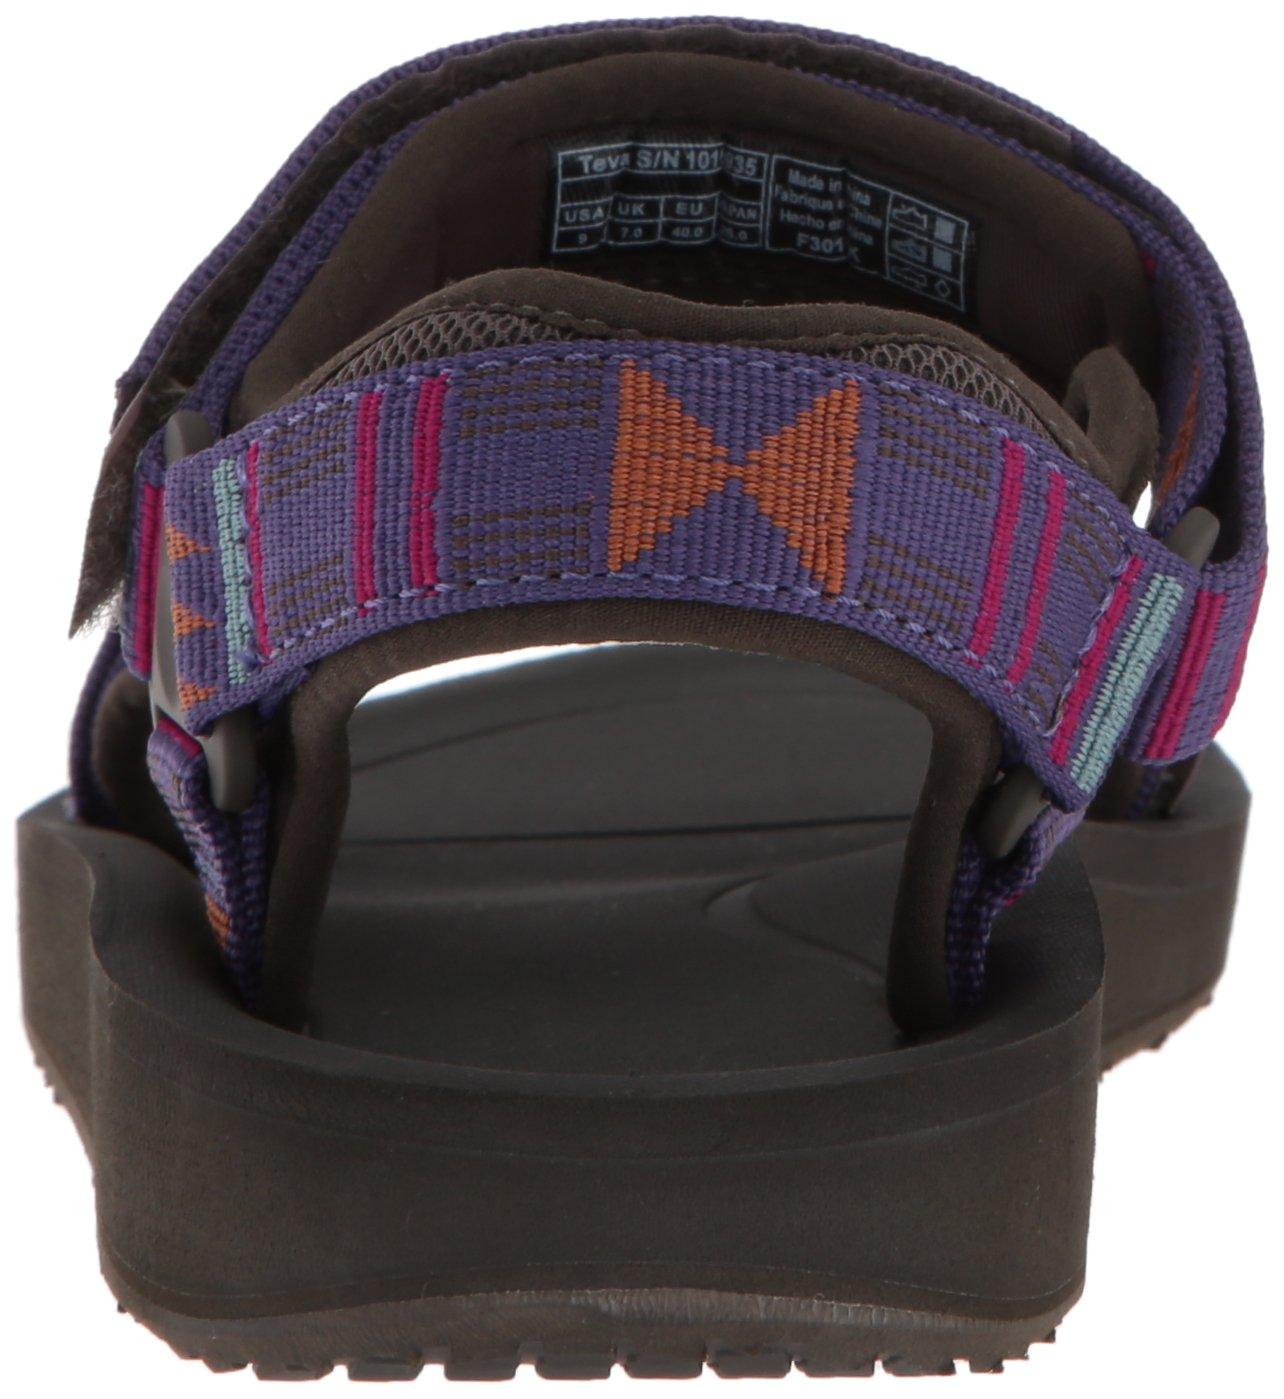 Teva Women's W Original Universal Premier Sandal B07212MCZK Deep 9 B(M) US|Beach Break Deep B07212MCZK Wisteria 47aa6e